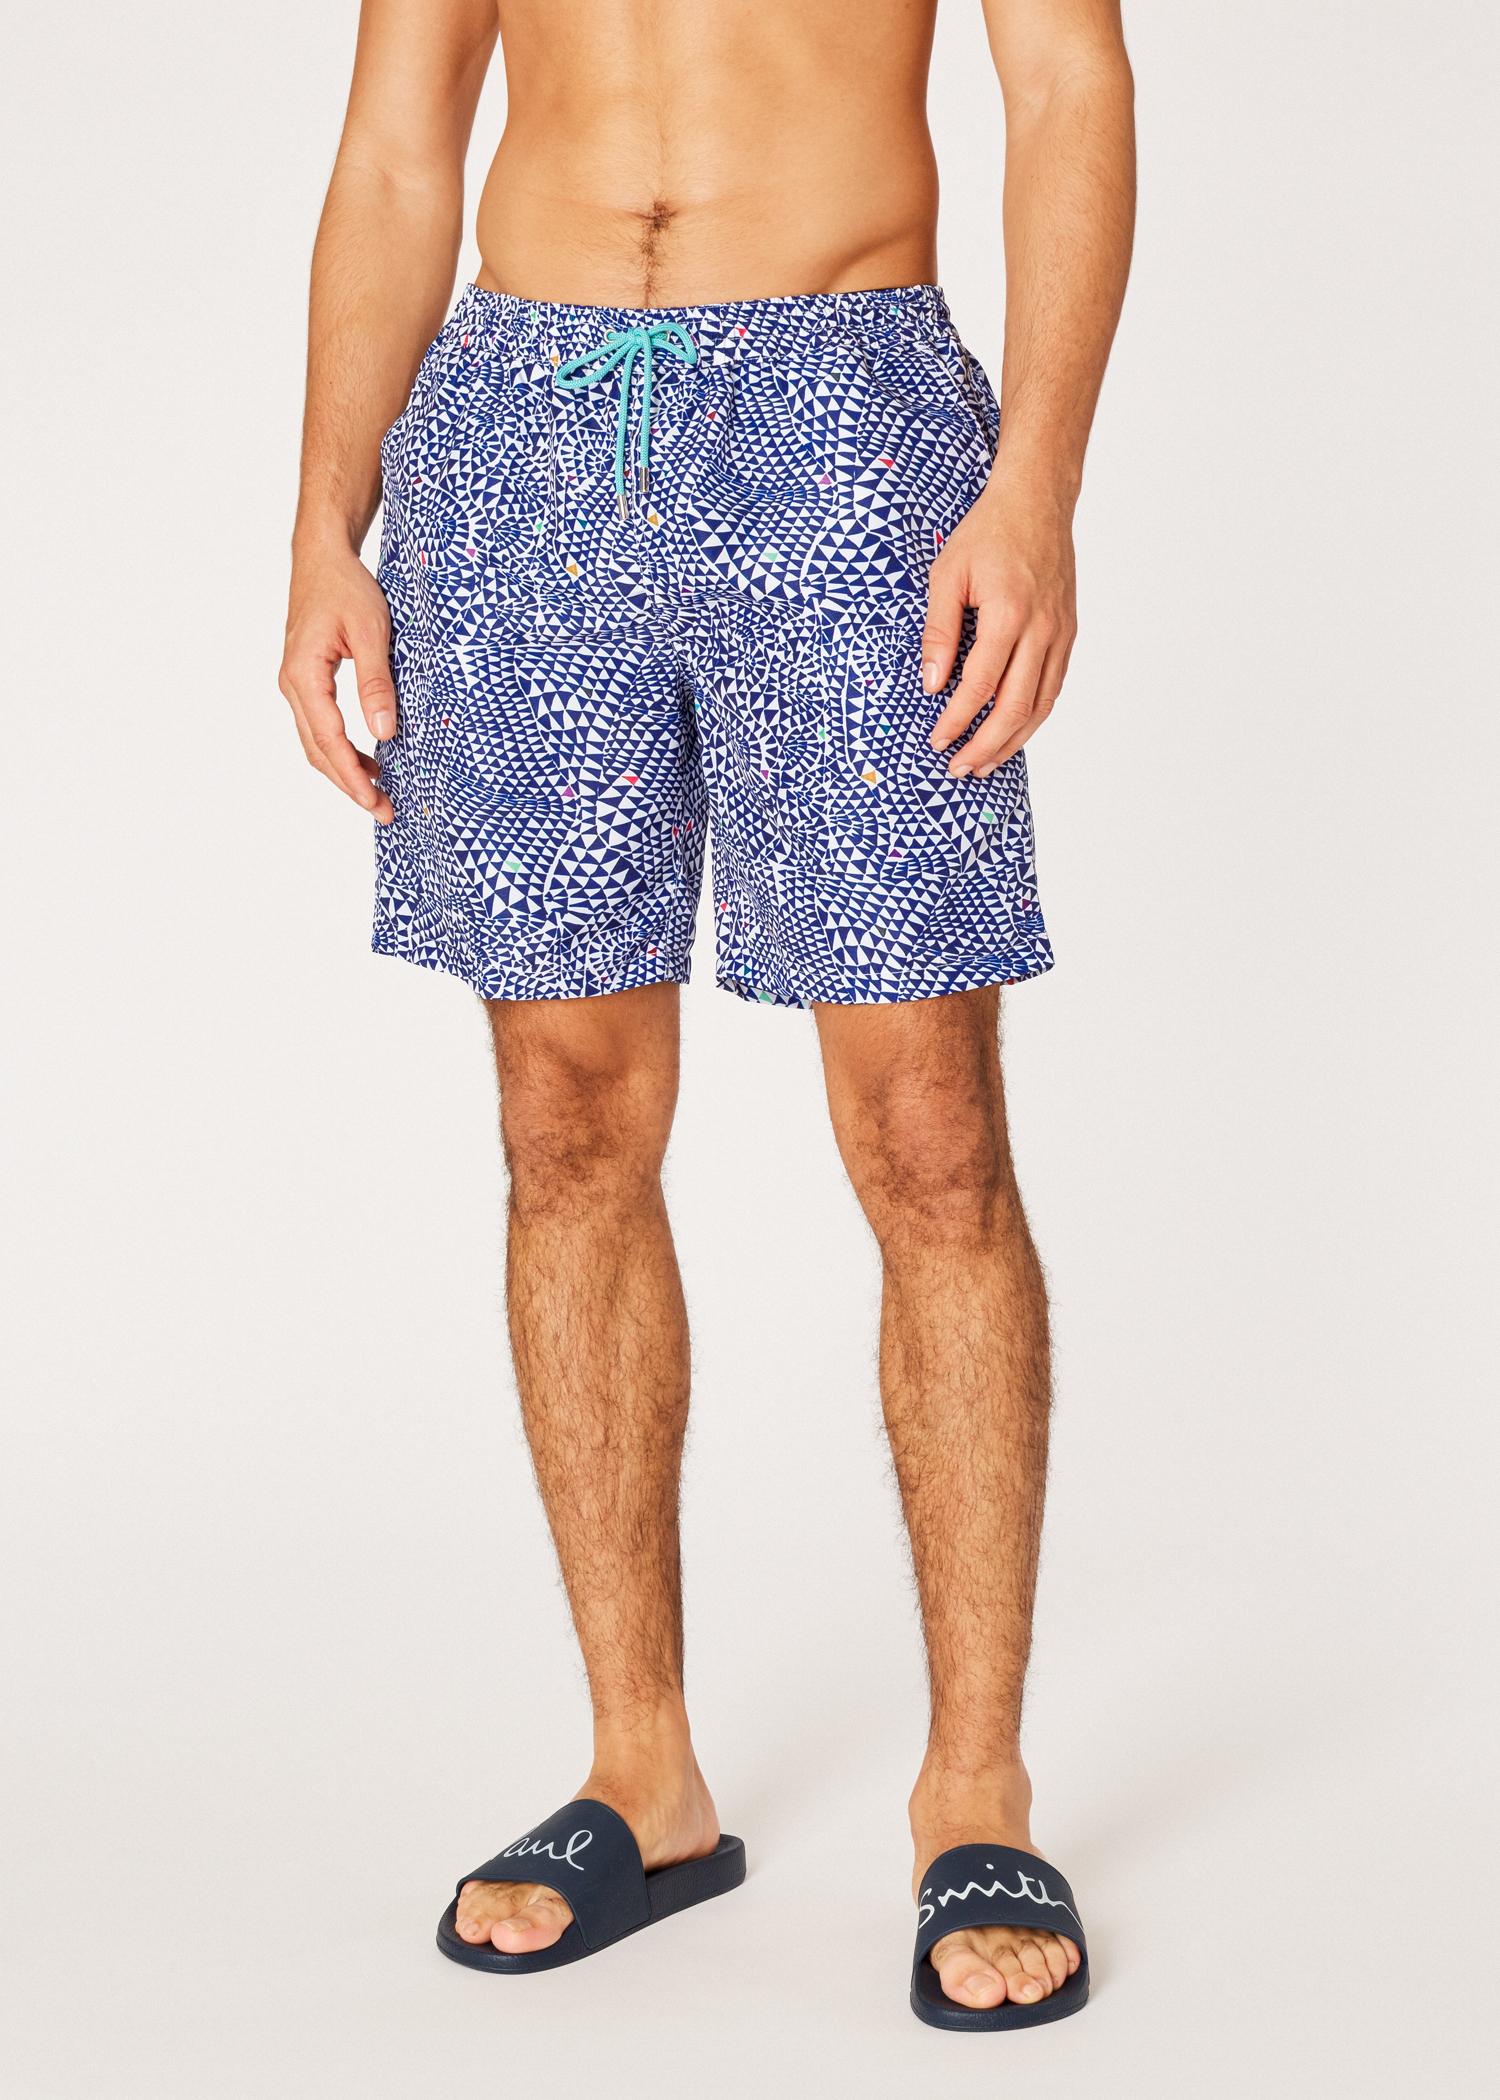 333fe9a61a04 Model front View - Men s Navy  Diamond Wave  Print Long Swim Shorts ...